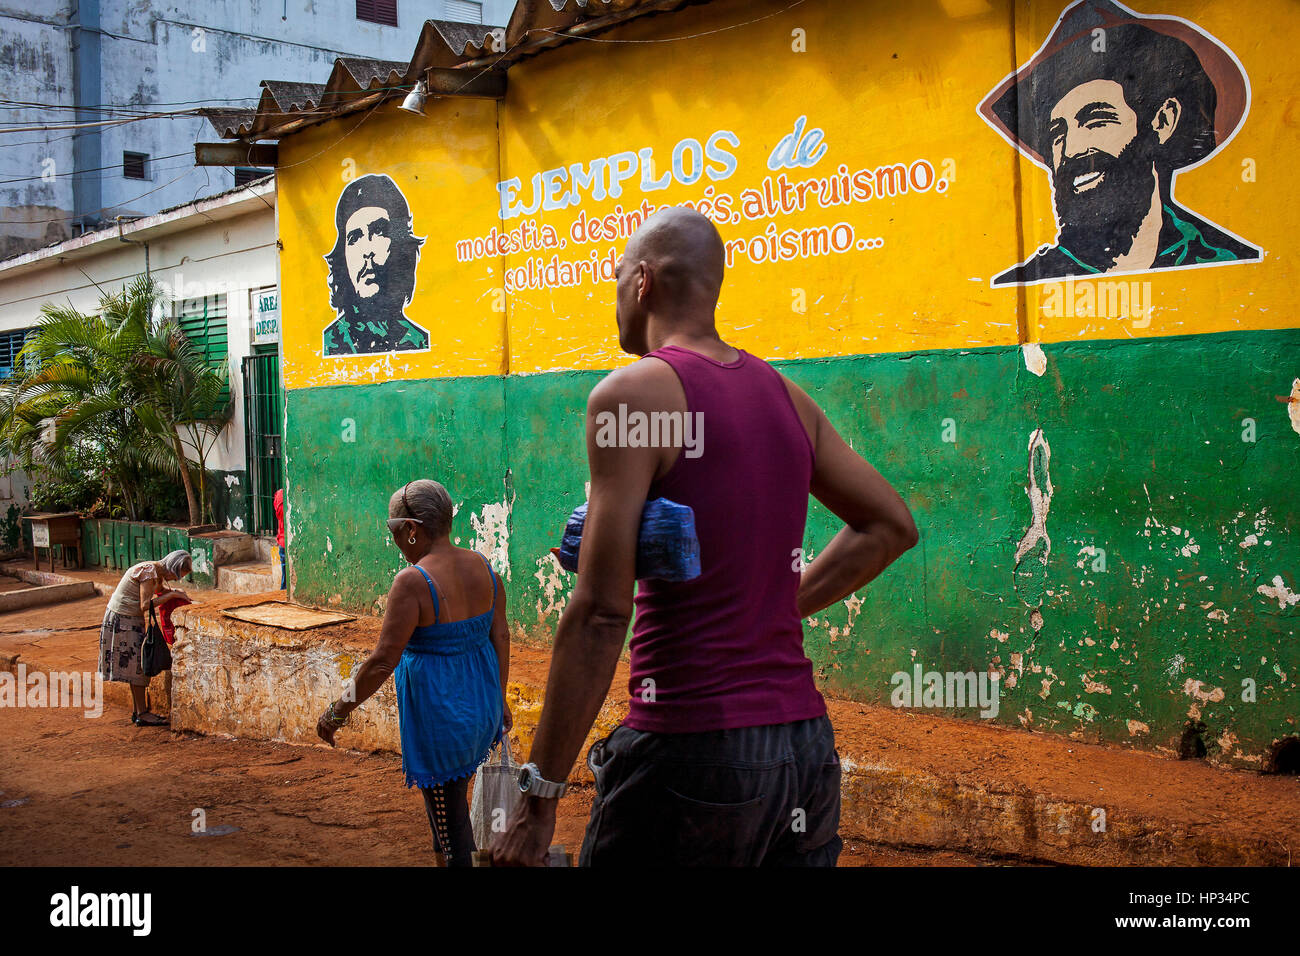 Political propaganda. Faces of Cienfuegos y Che, painted on a street wall,Habana Vieja, La Habana, Cuba - Stock Image